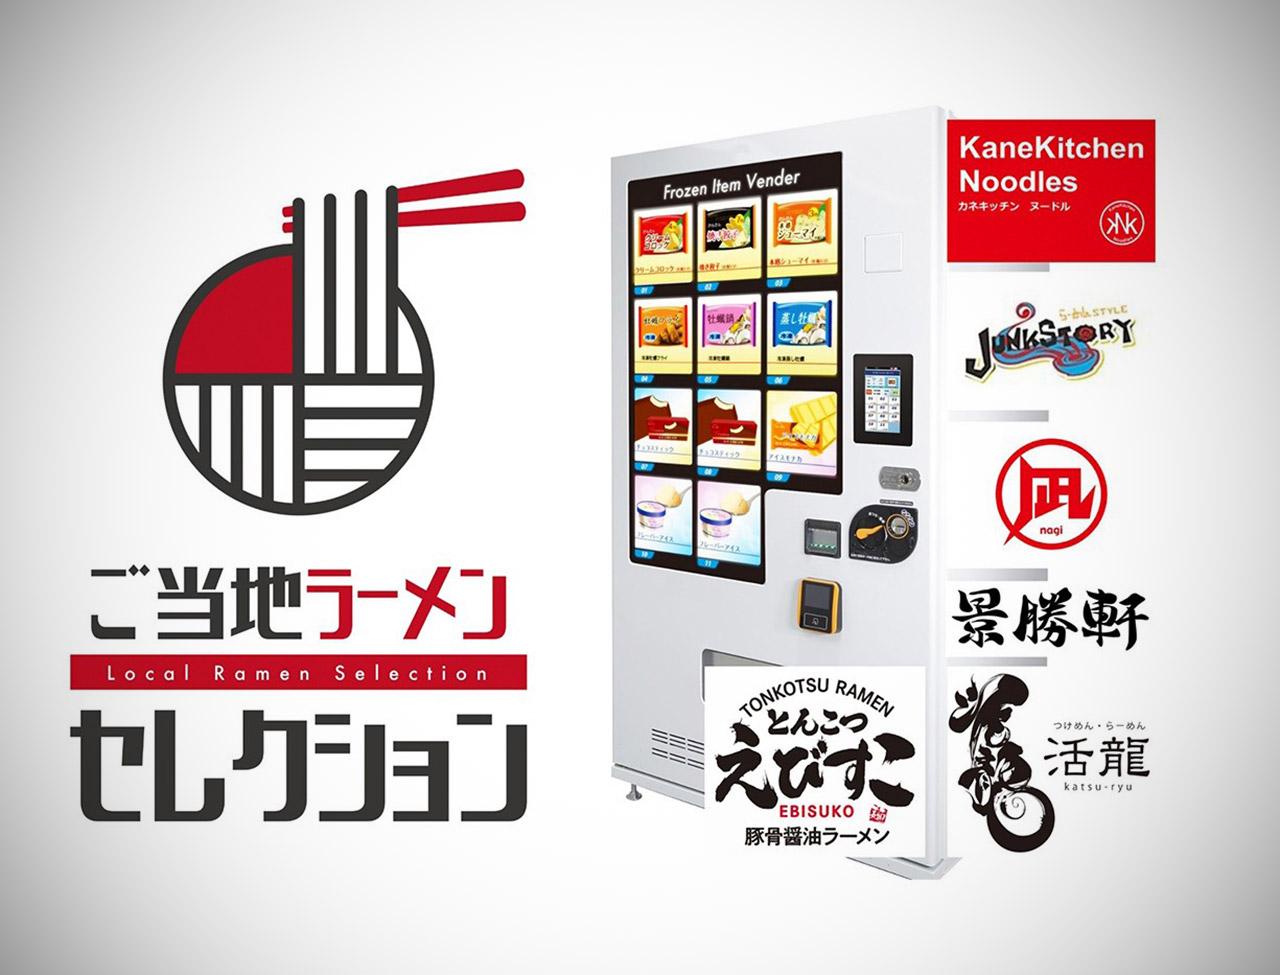 Japan Local Ramen Selection Vending Machine Michelin